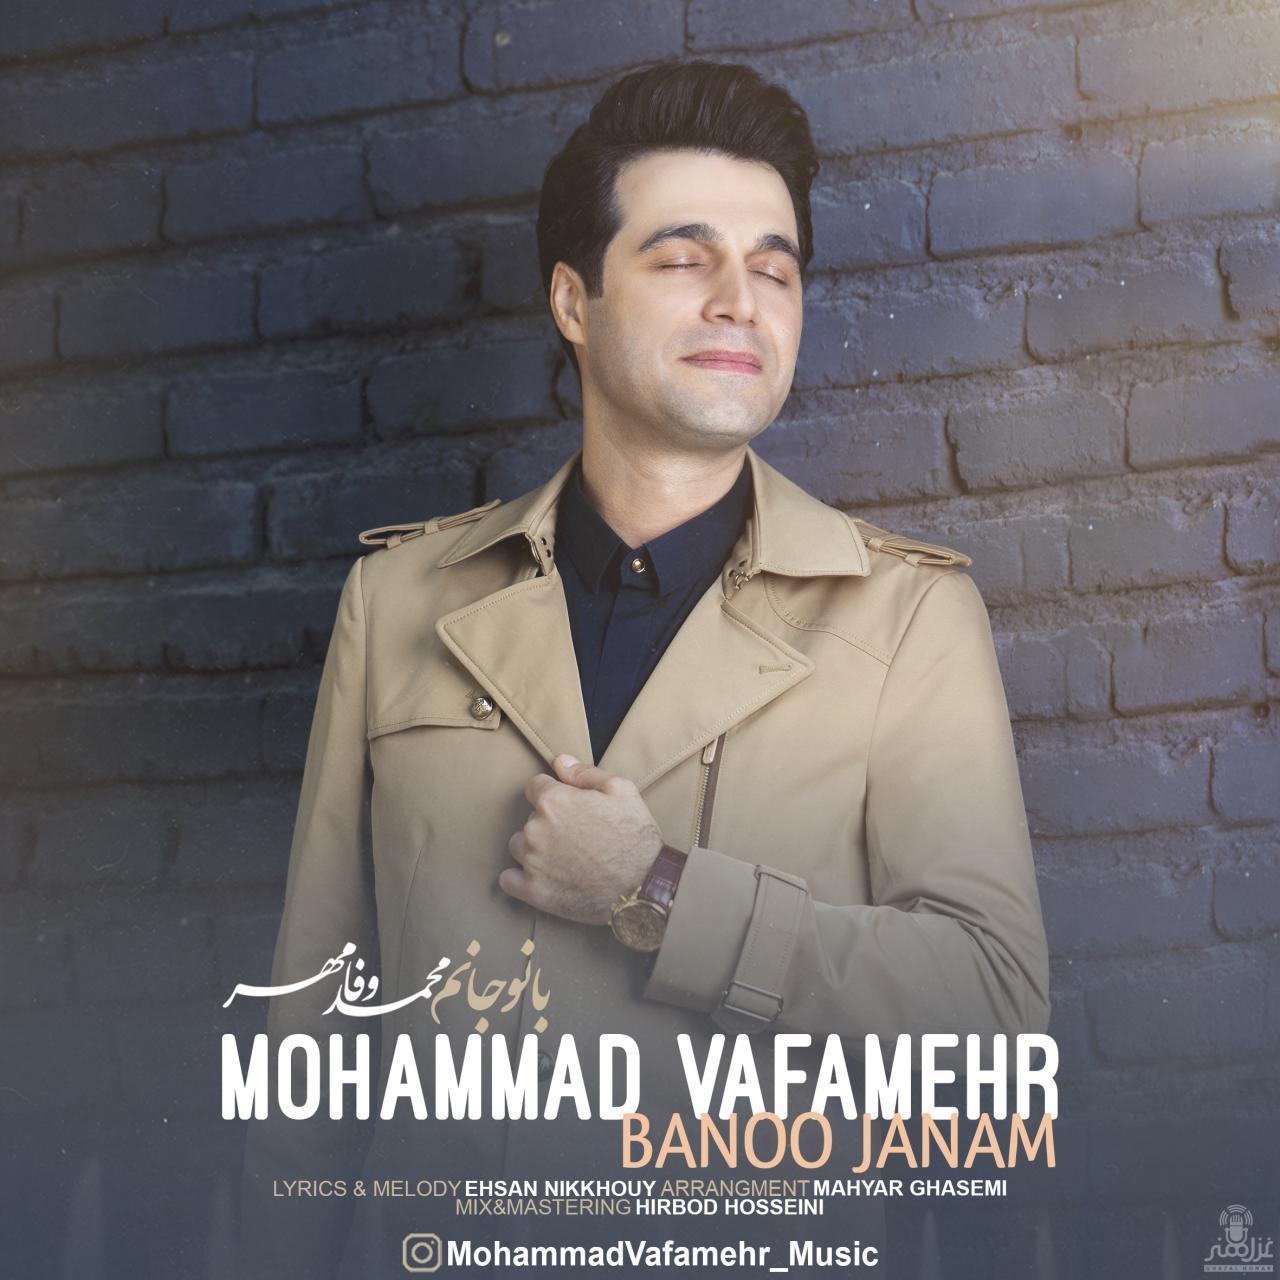 Mohammad Vafamehr – Banoo Janam